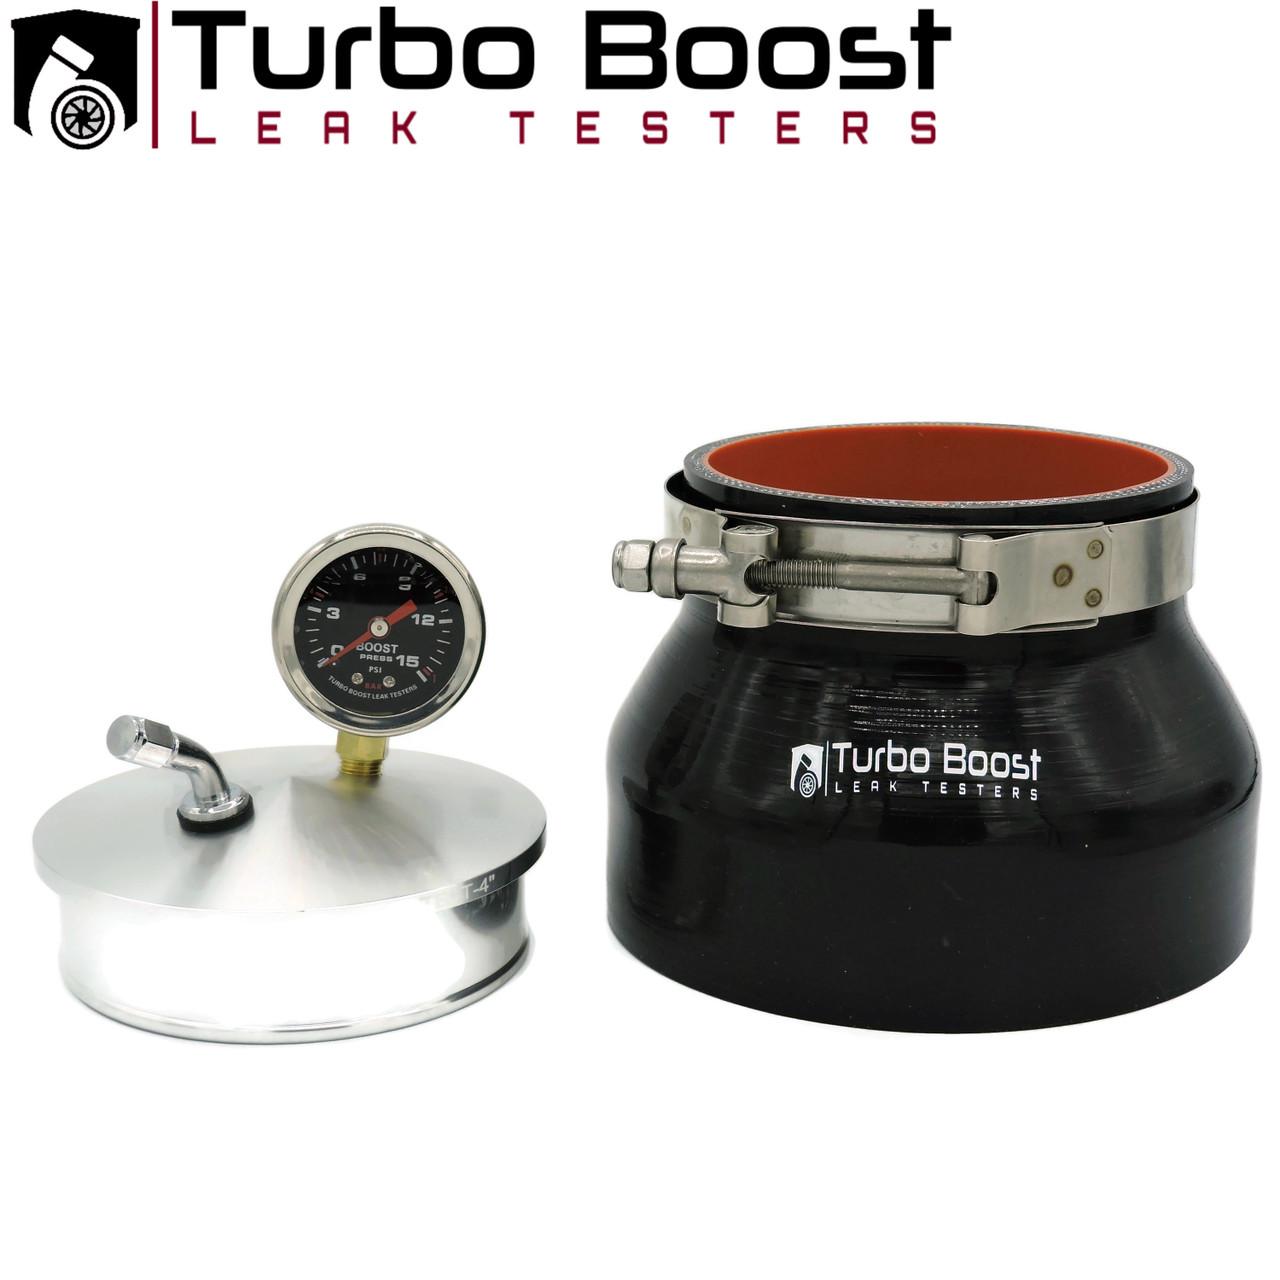 "5.5"" Pro-Kit Turbo Boost Leak Tester - Billet 6061 Aluminum"